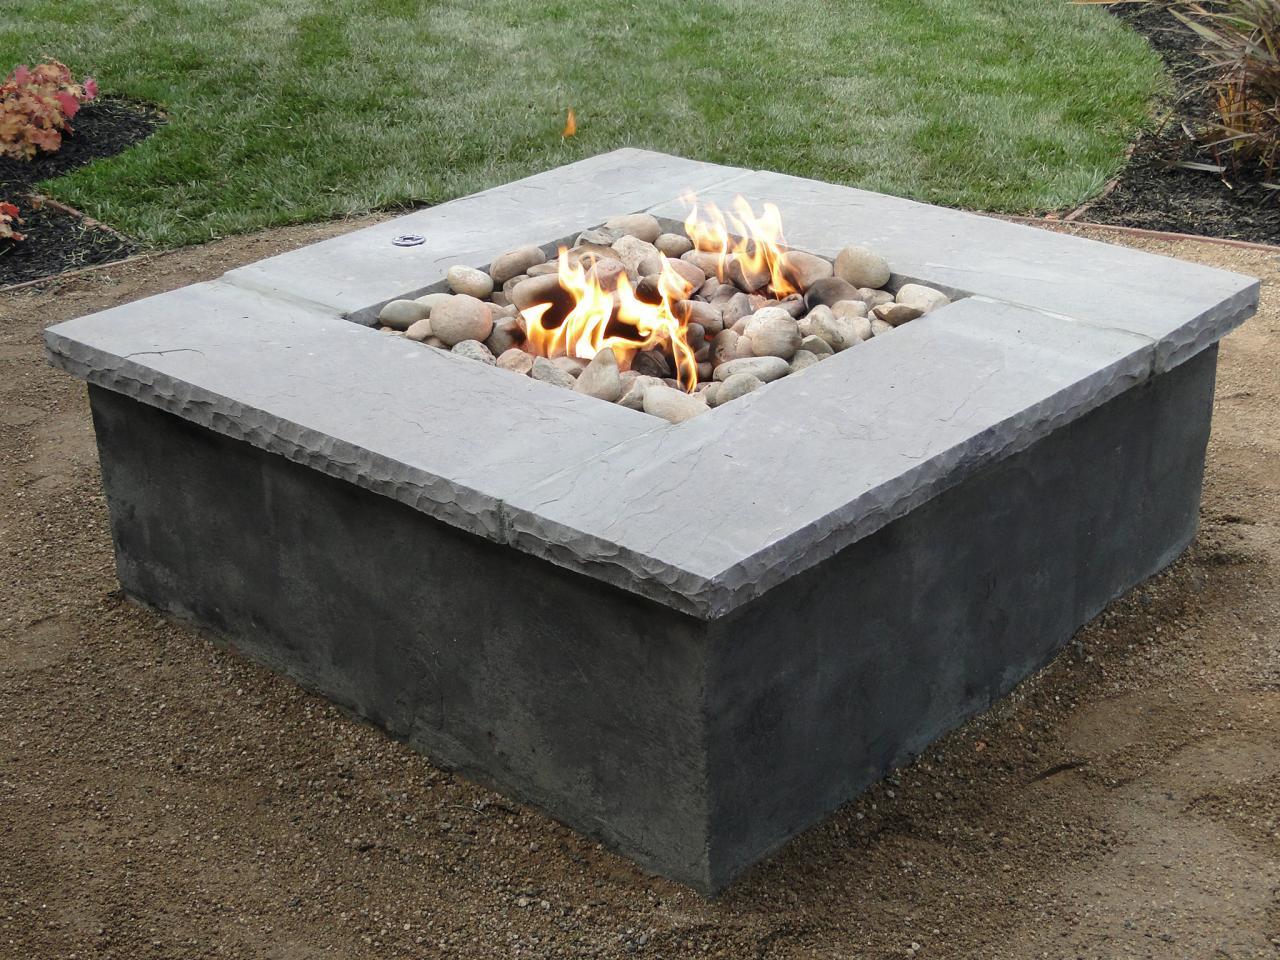 diy concrete propane fire pit fireplace design ideas. Black Bedroom Furniture Sets. Home Design Ideas